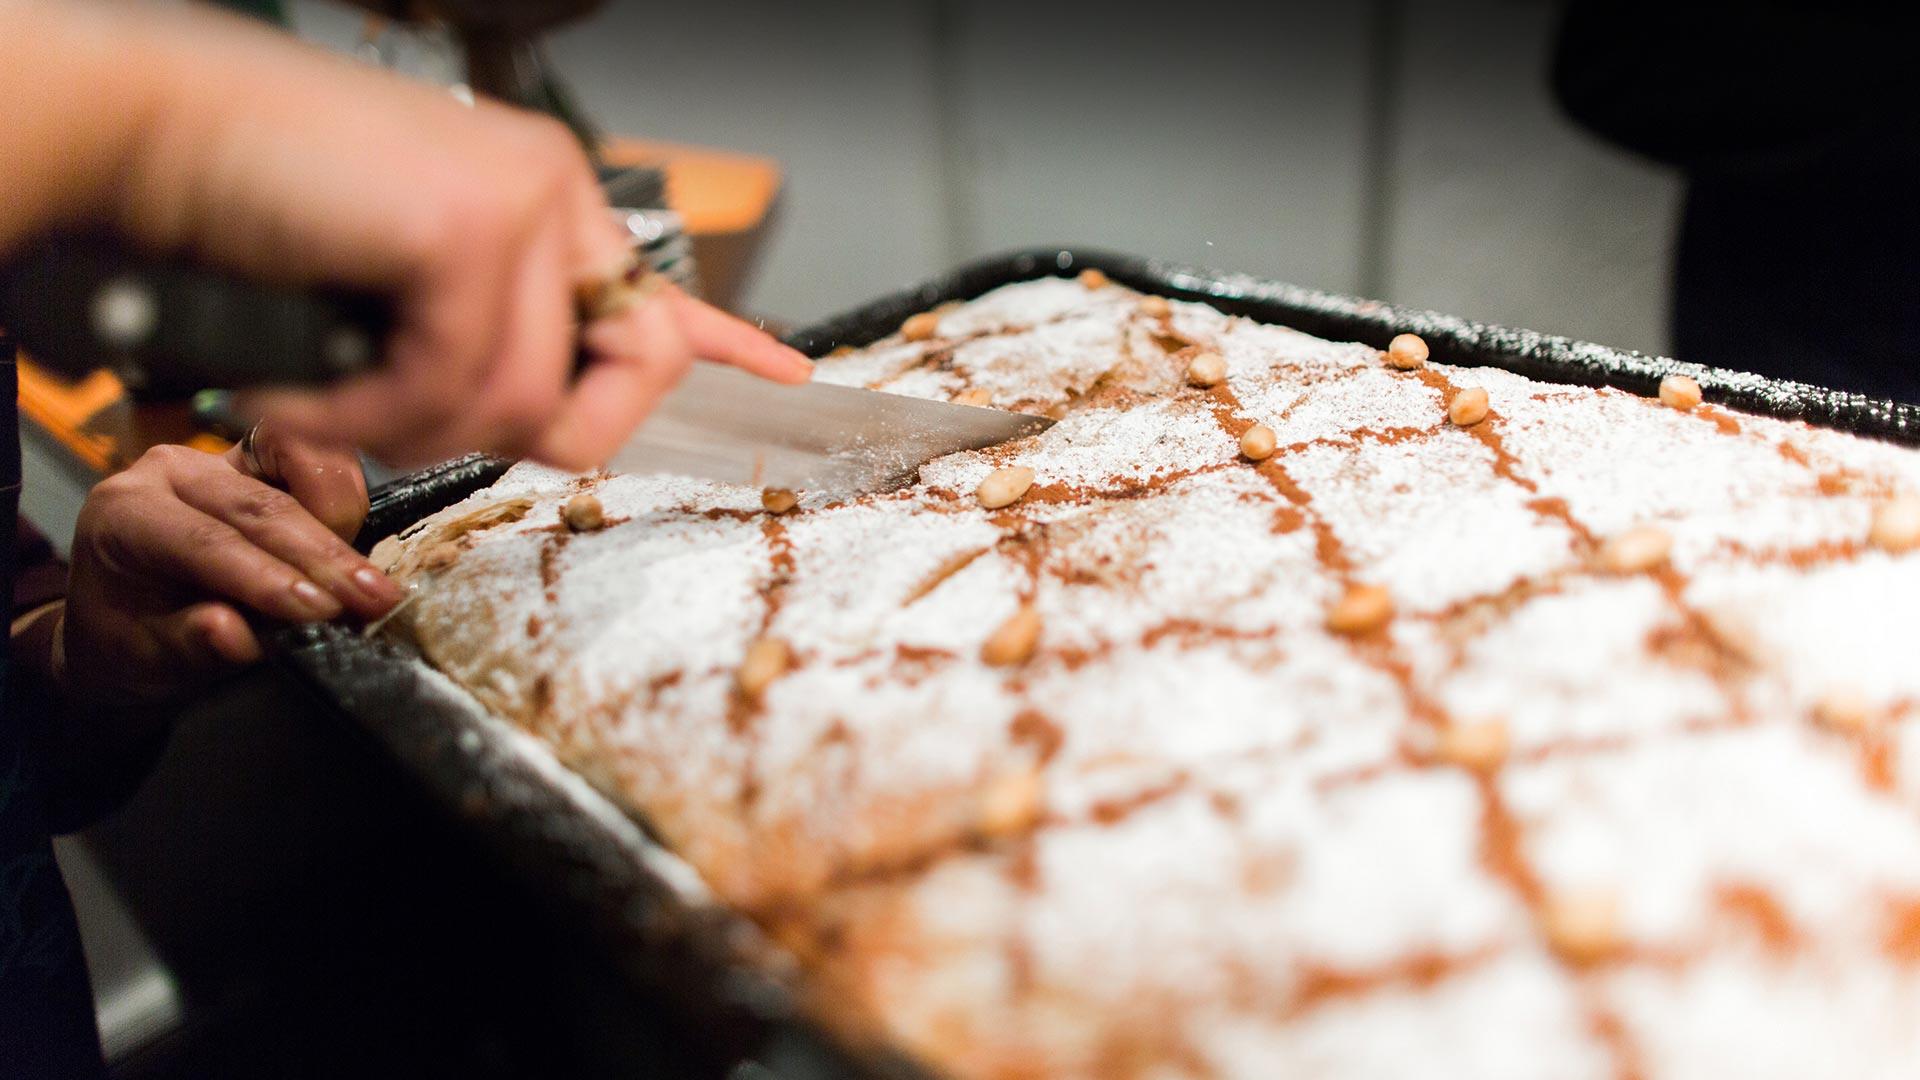 Süßes Gebäck wird geschnitten